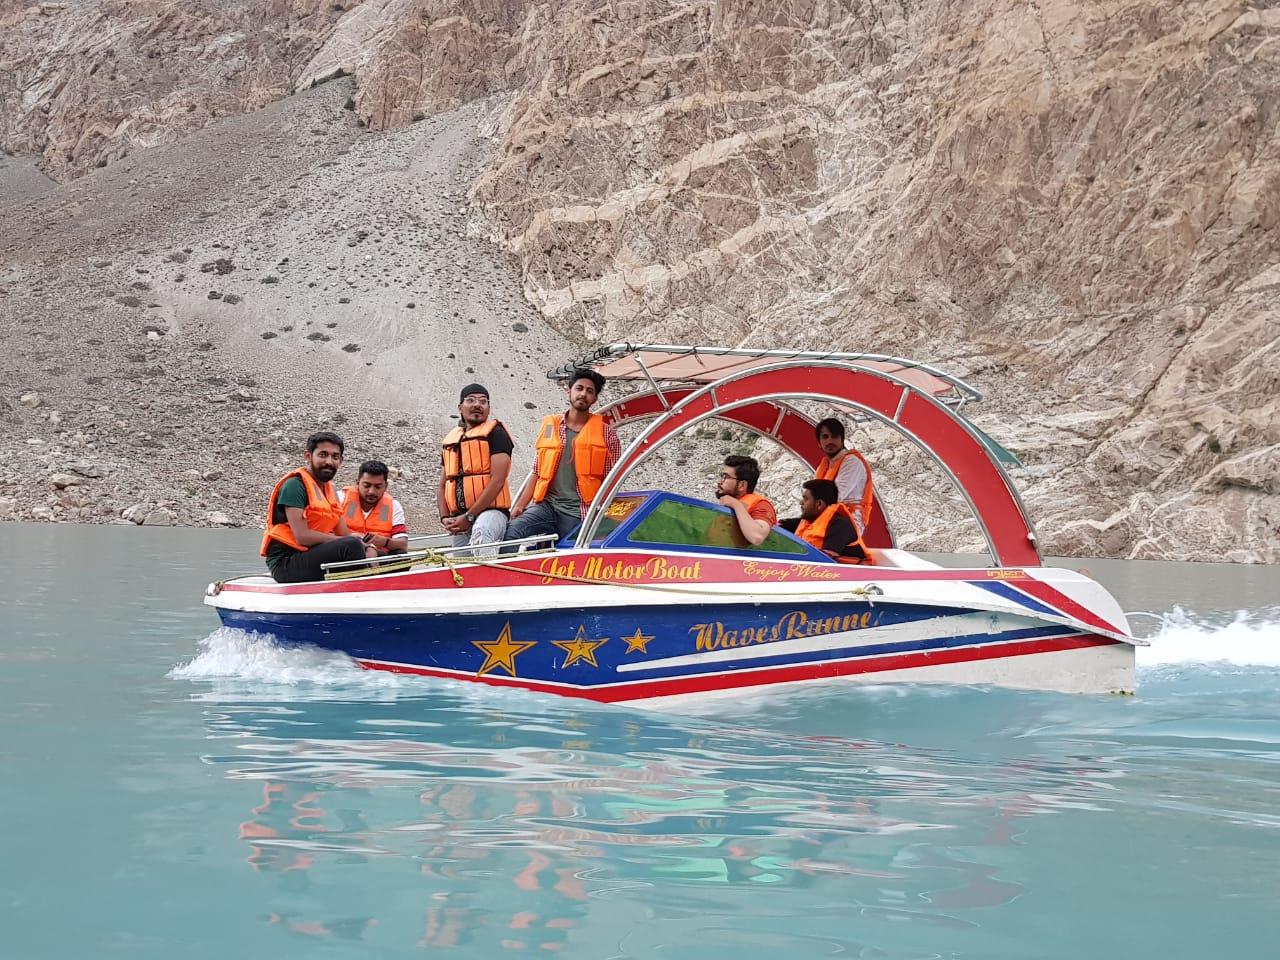 fairy-meadows-boat